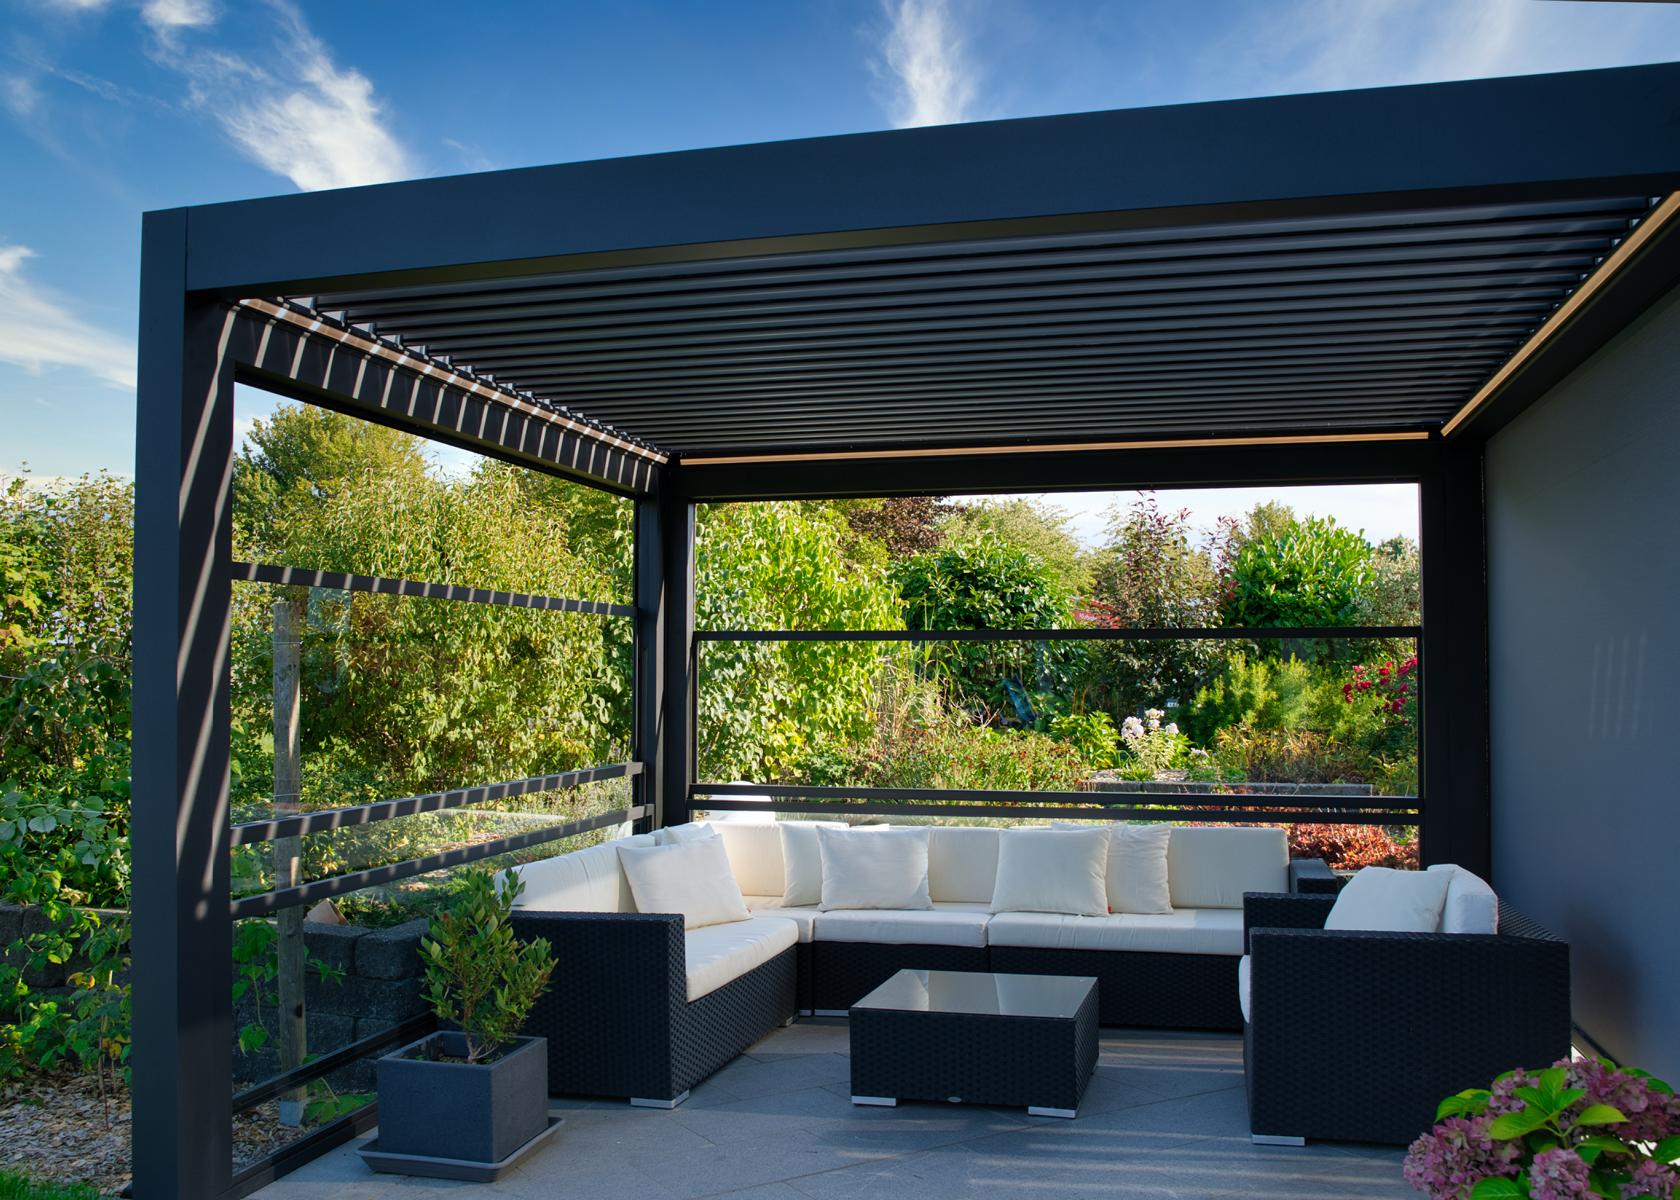 lamellendach skyroof palmiye terrassenueberdachung privat 82springe .JPG - Lamellendach bietet geschützten Terrassenplatz - Referenz-Projekt